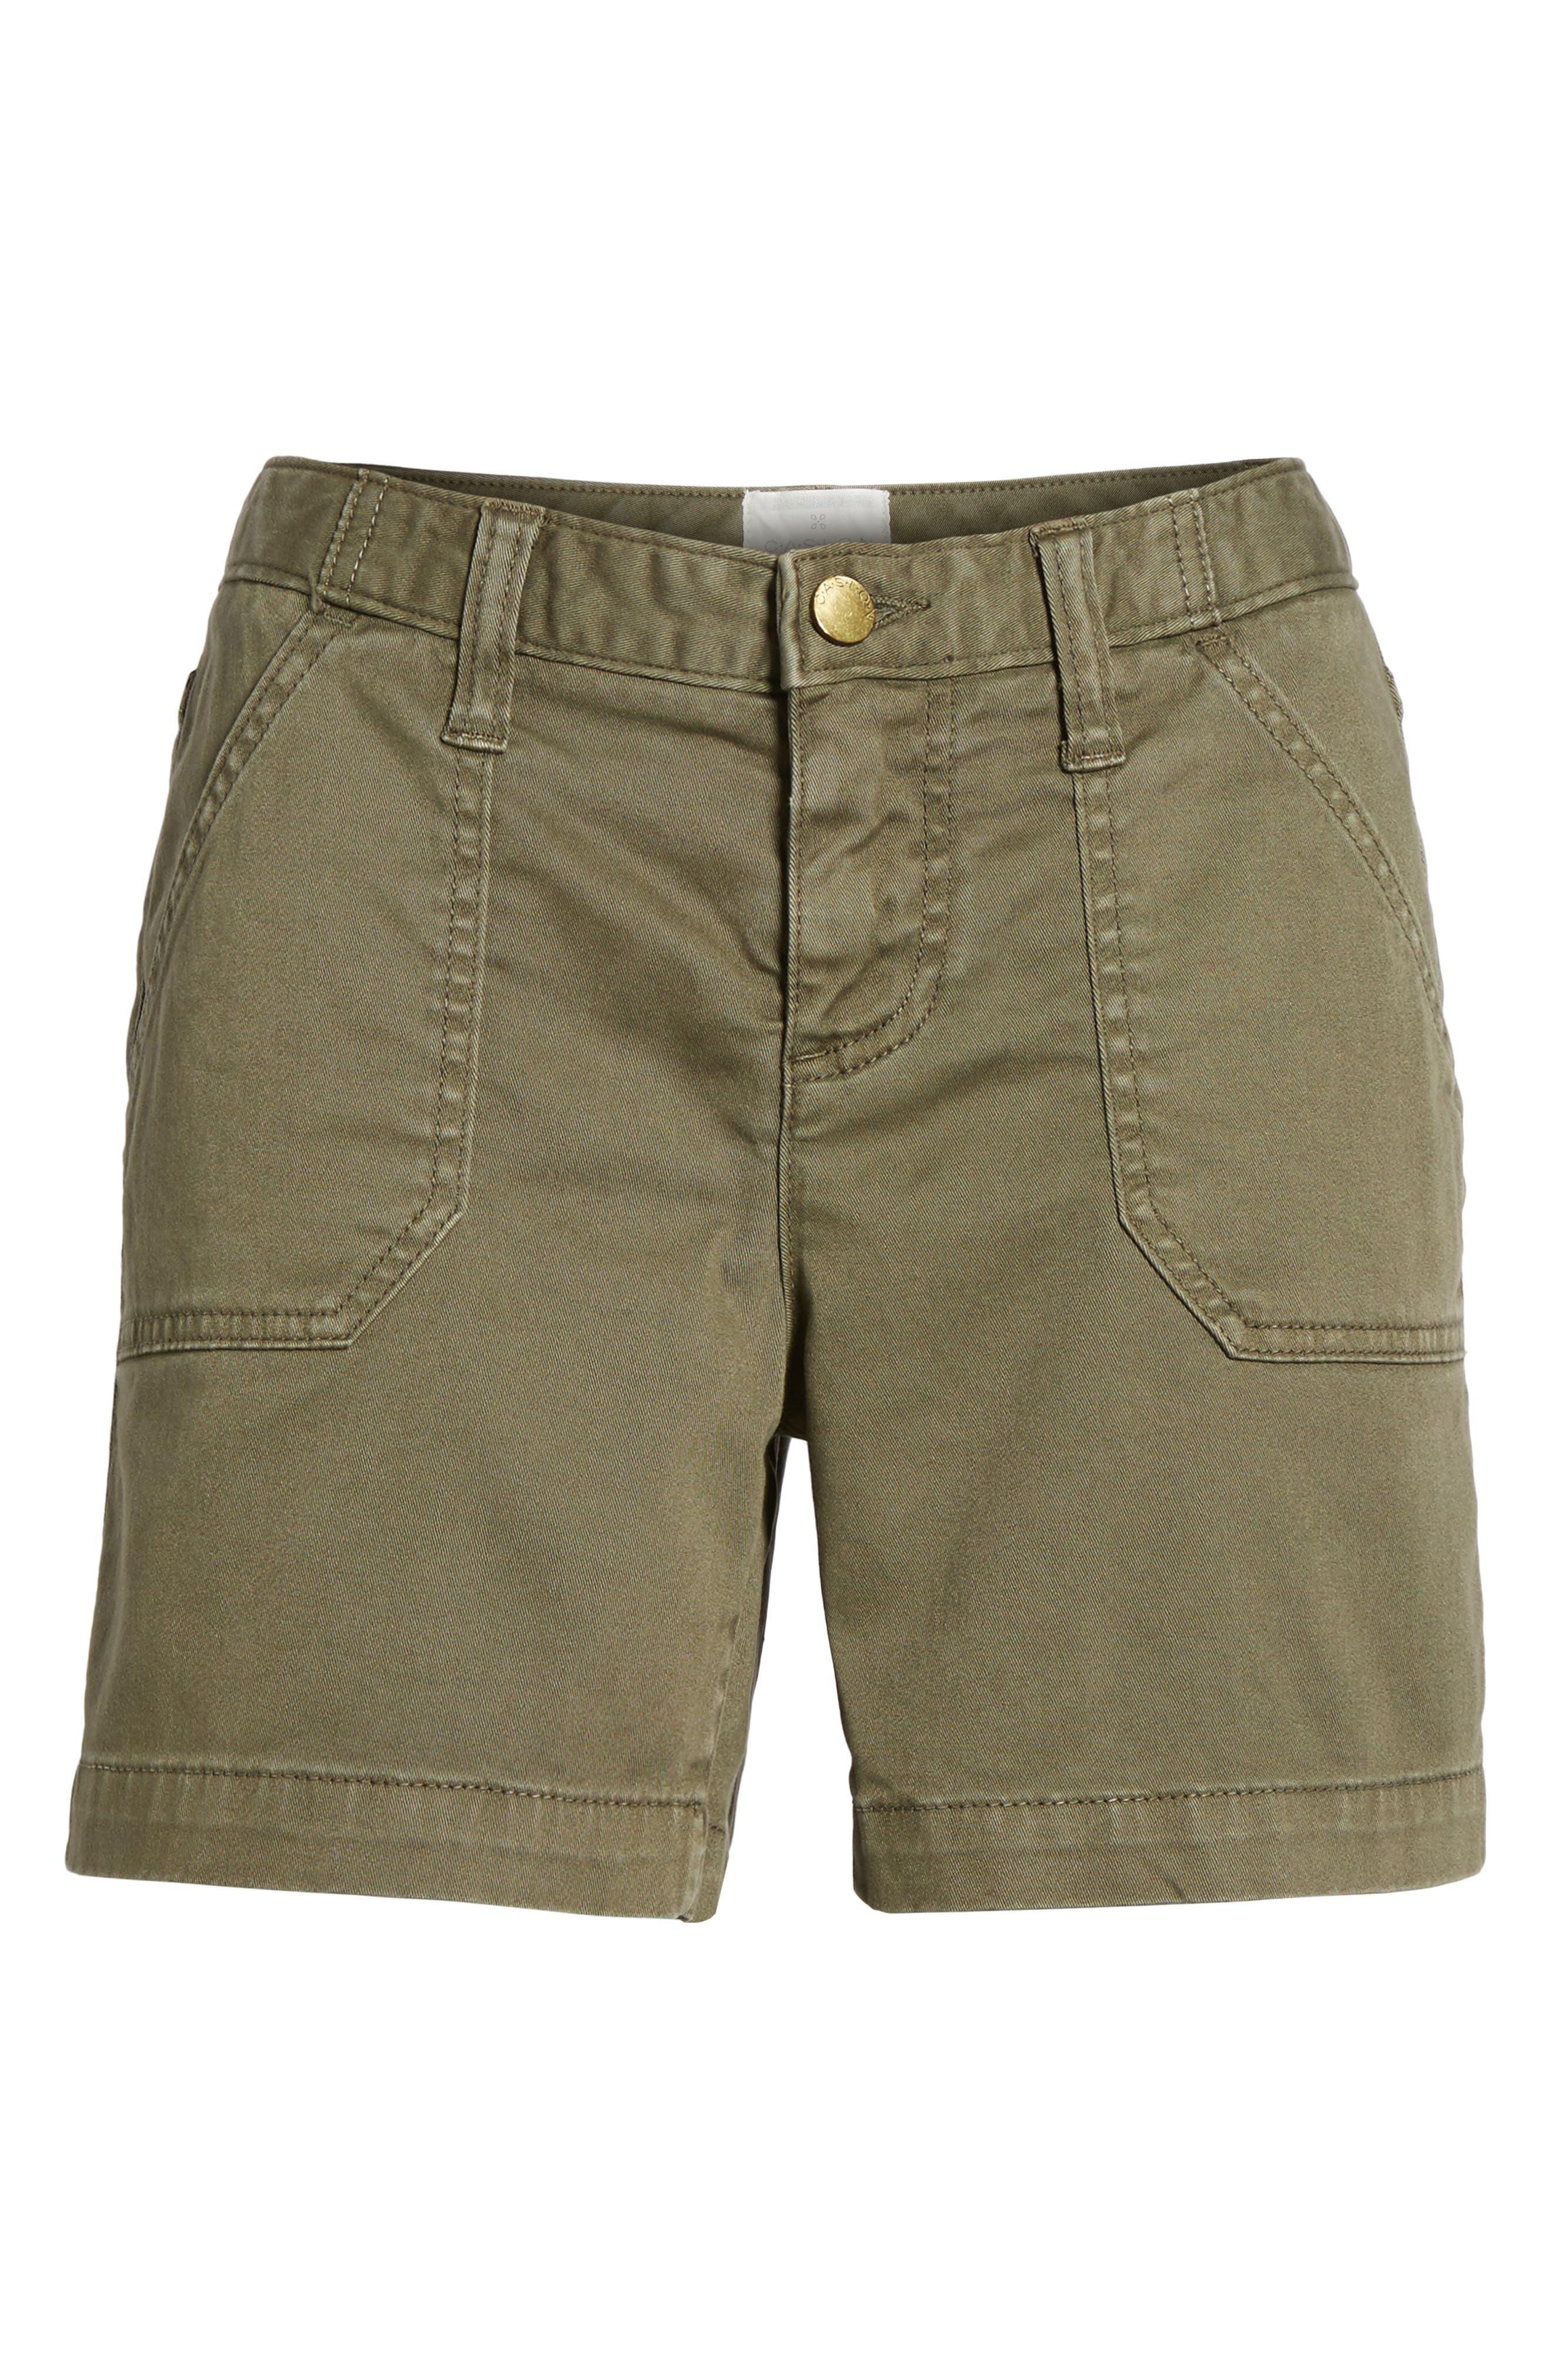 Utility Shorts,                             Alternate thumbnail 31, color,